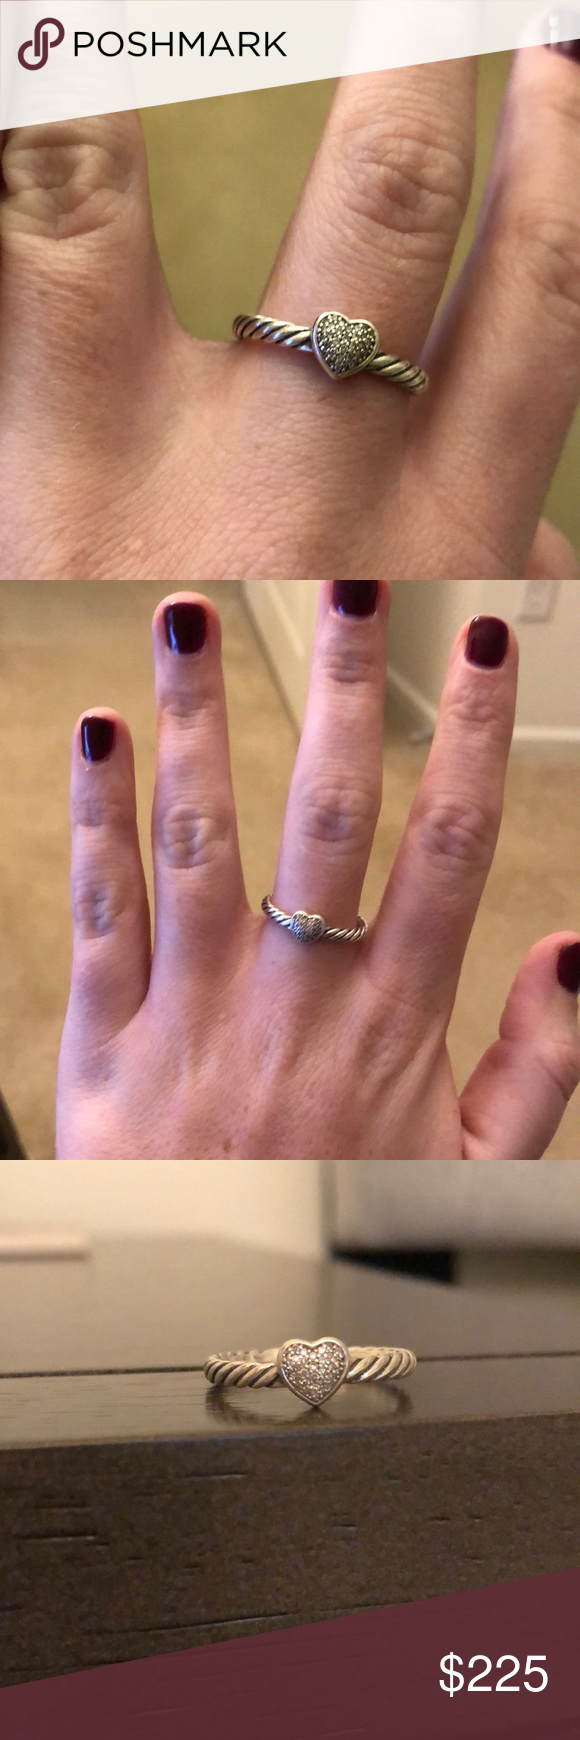 c0a6545aeb9853 David Yurman Petite Pave Heart Ring w/ Diamonds David Yurman ring David  Yurman Jewelry Rings